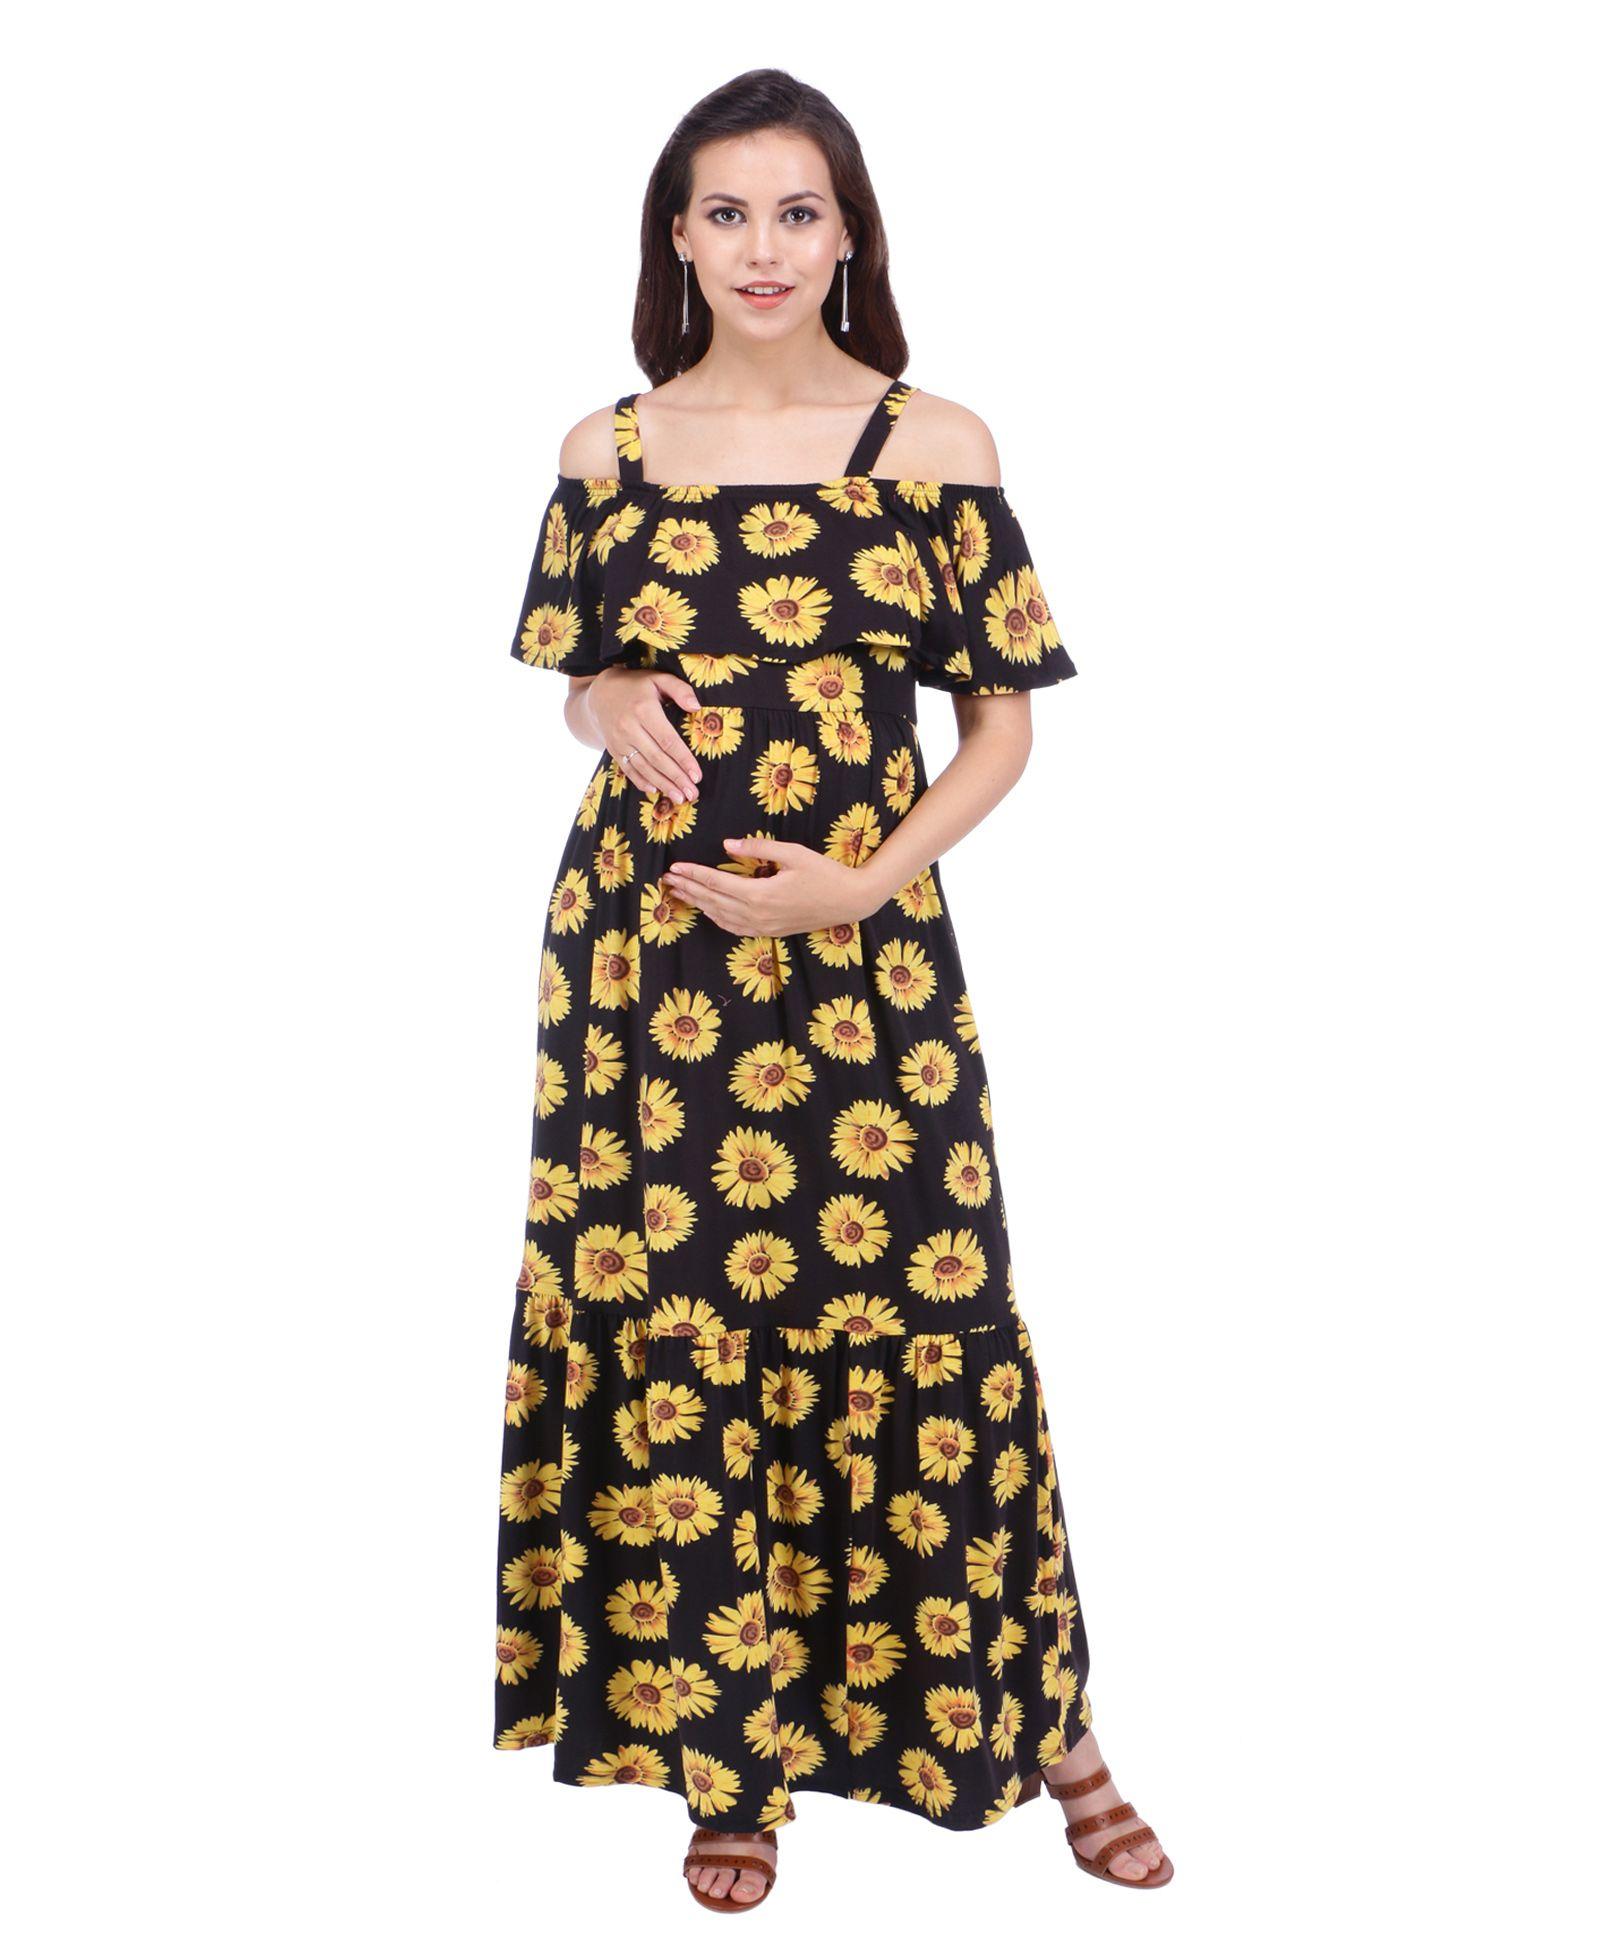 e6ff20966d1f8 MomToBe Cold Shoulder Maternity Dress Sunflower Print Black ...